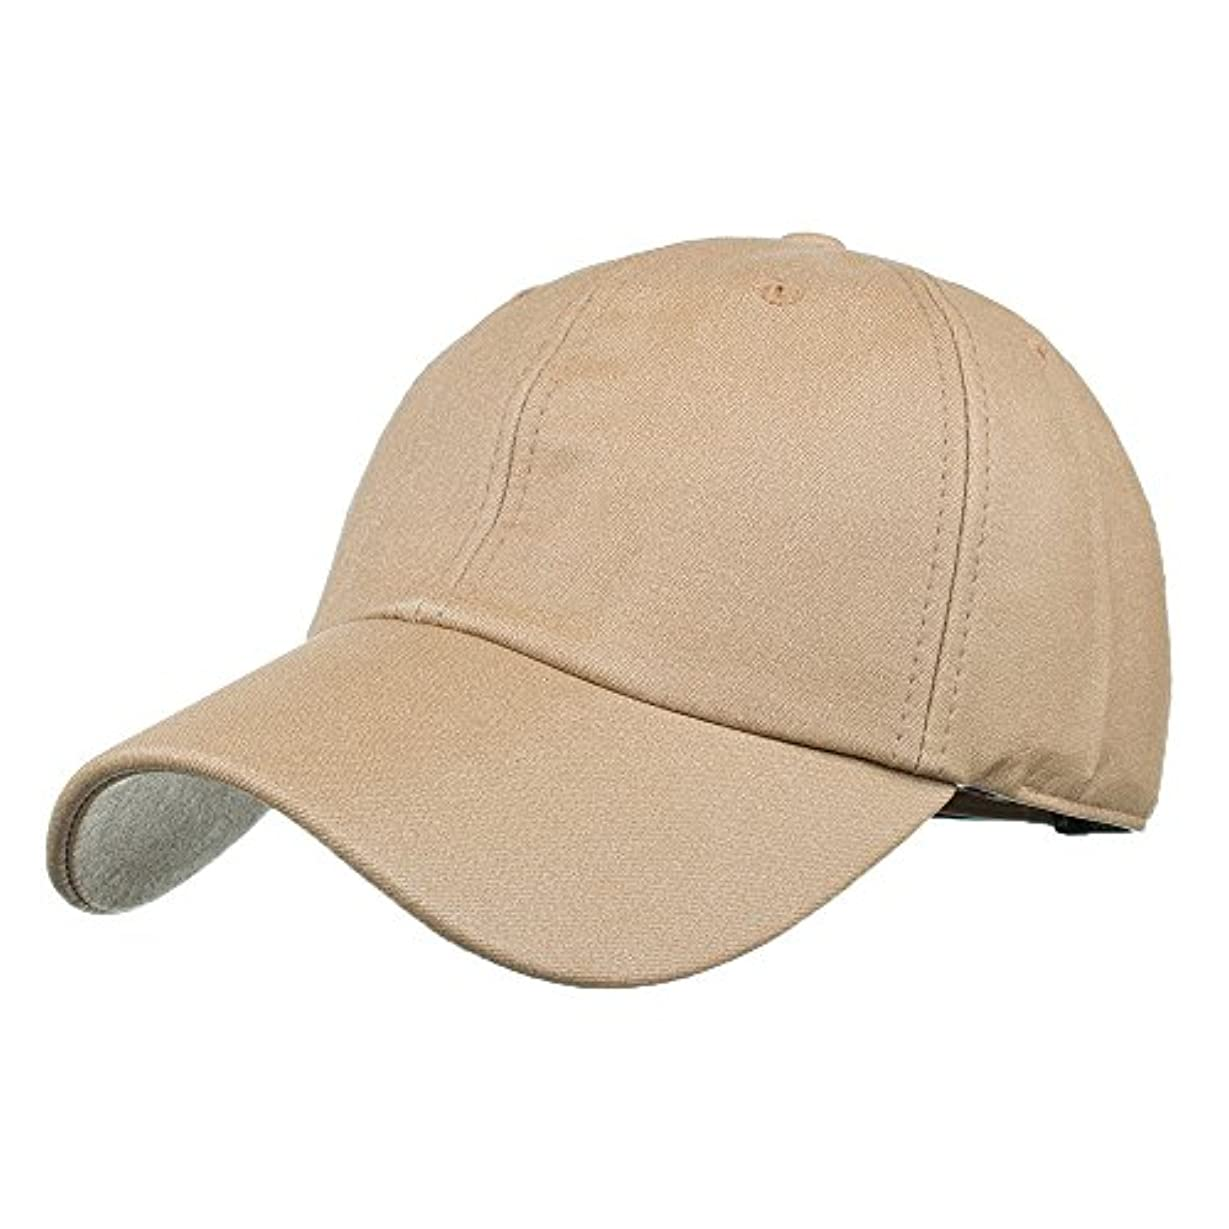 Racazing Cap PU 無地 ヒップホップ 野球帽 通気性のある 帽子 夏 登山 可調整可能 棒球帽 UV 帽子 軽量 屋外 Unisex Hat (カーキ)